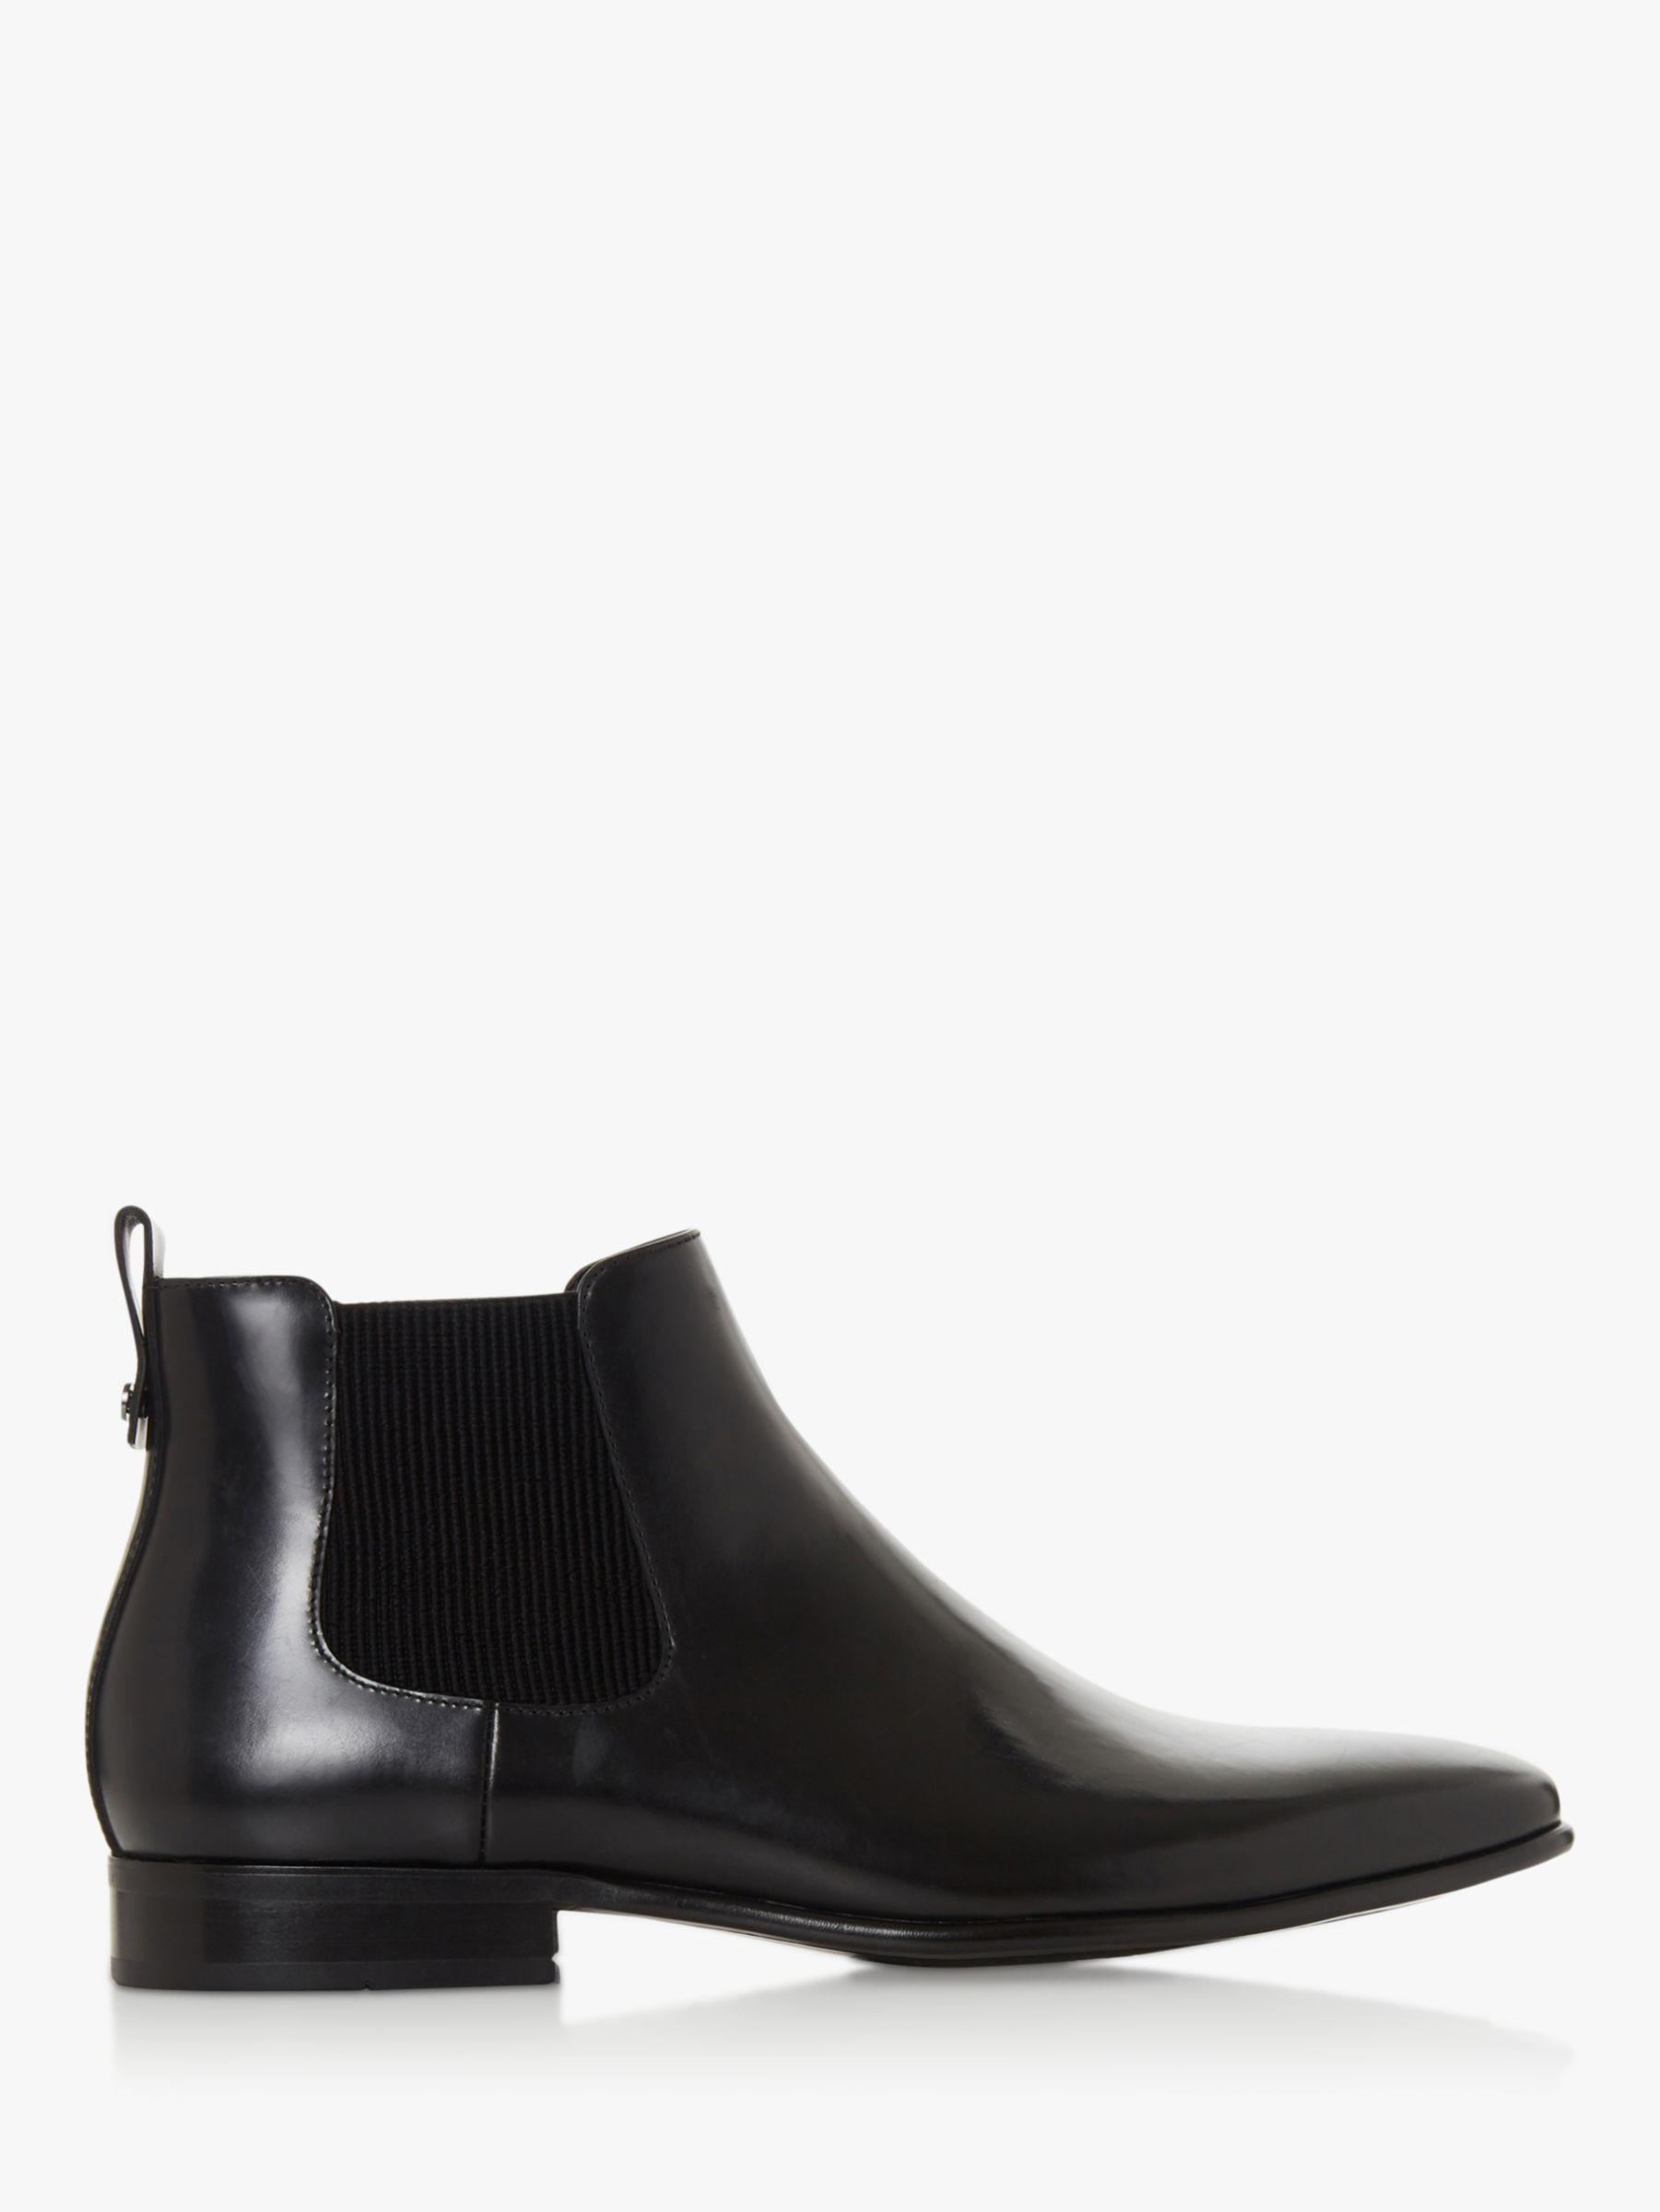 Dune Dune Morton Leather Chelsea Boots, Black